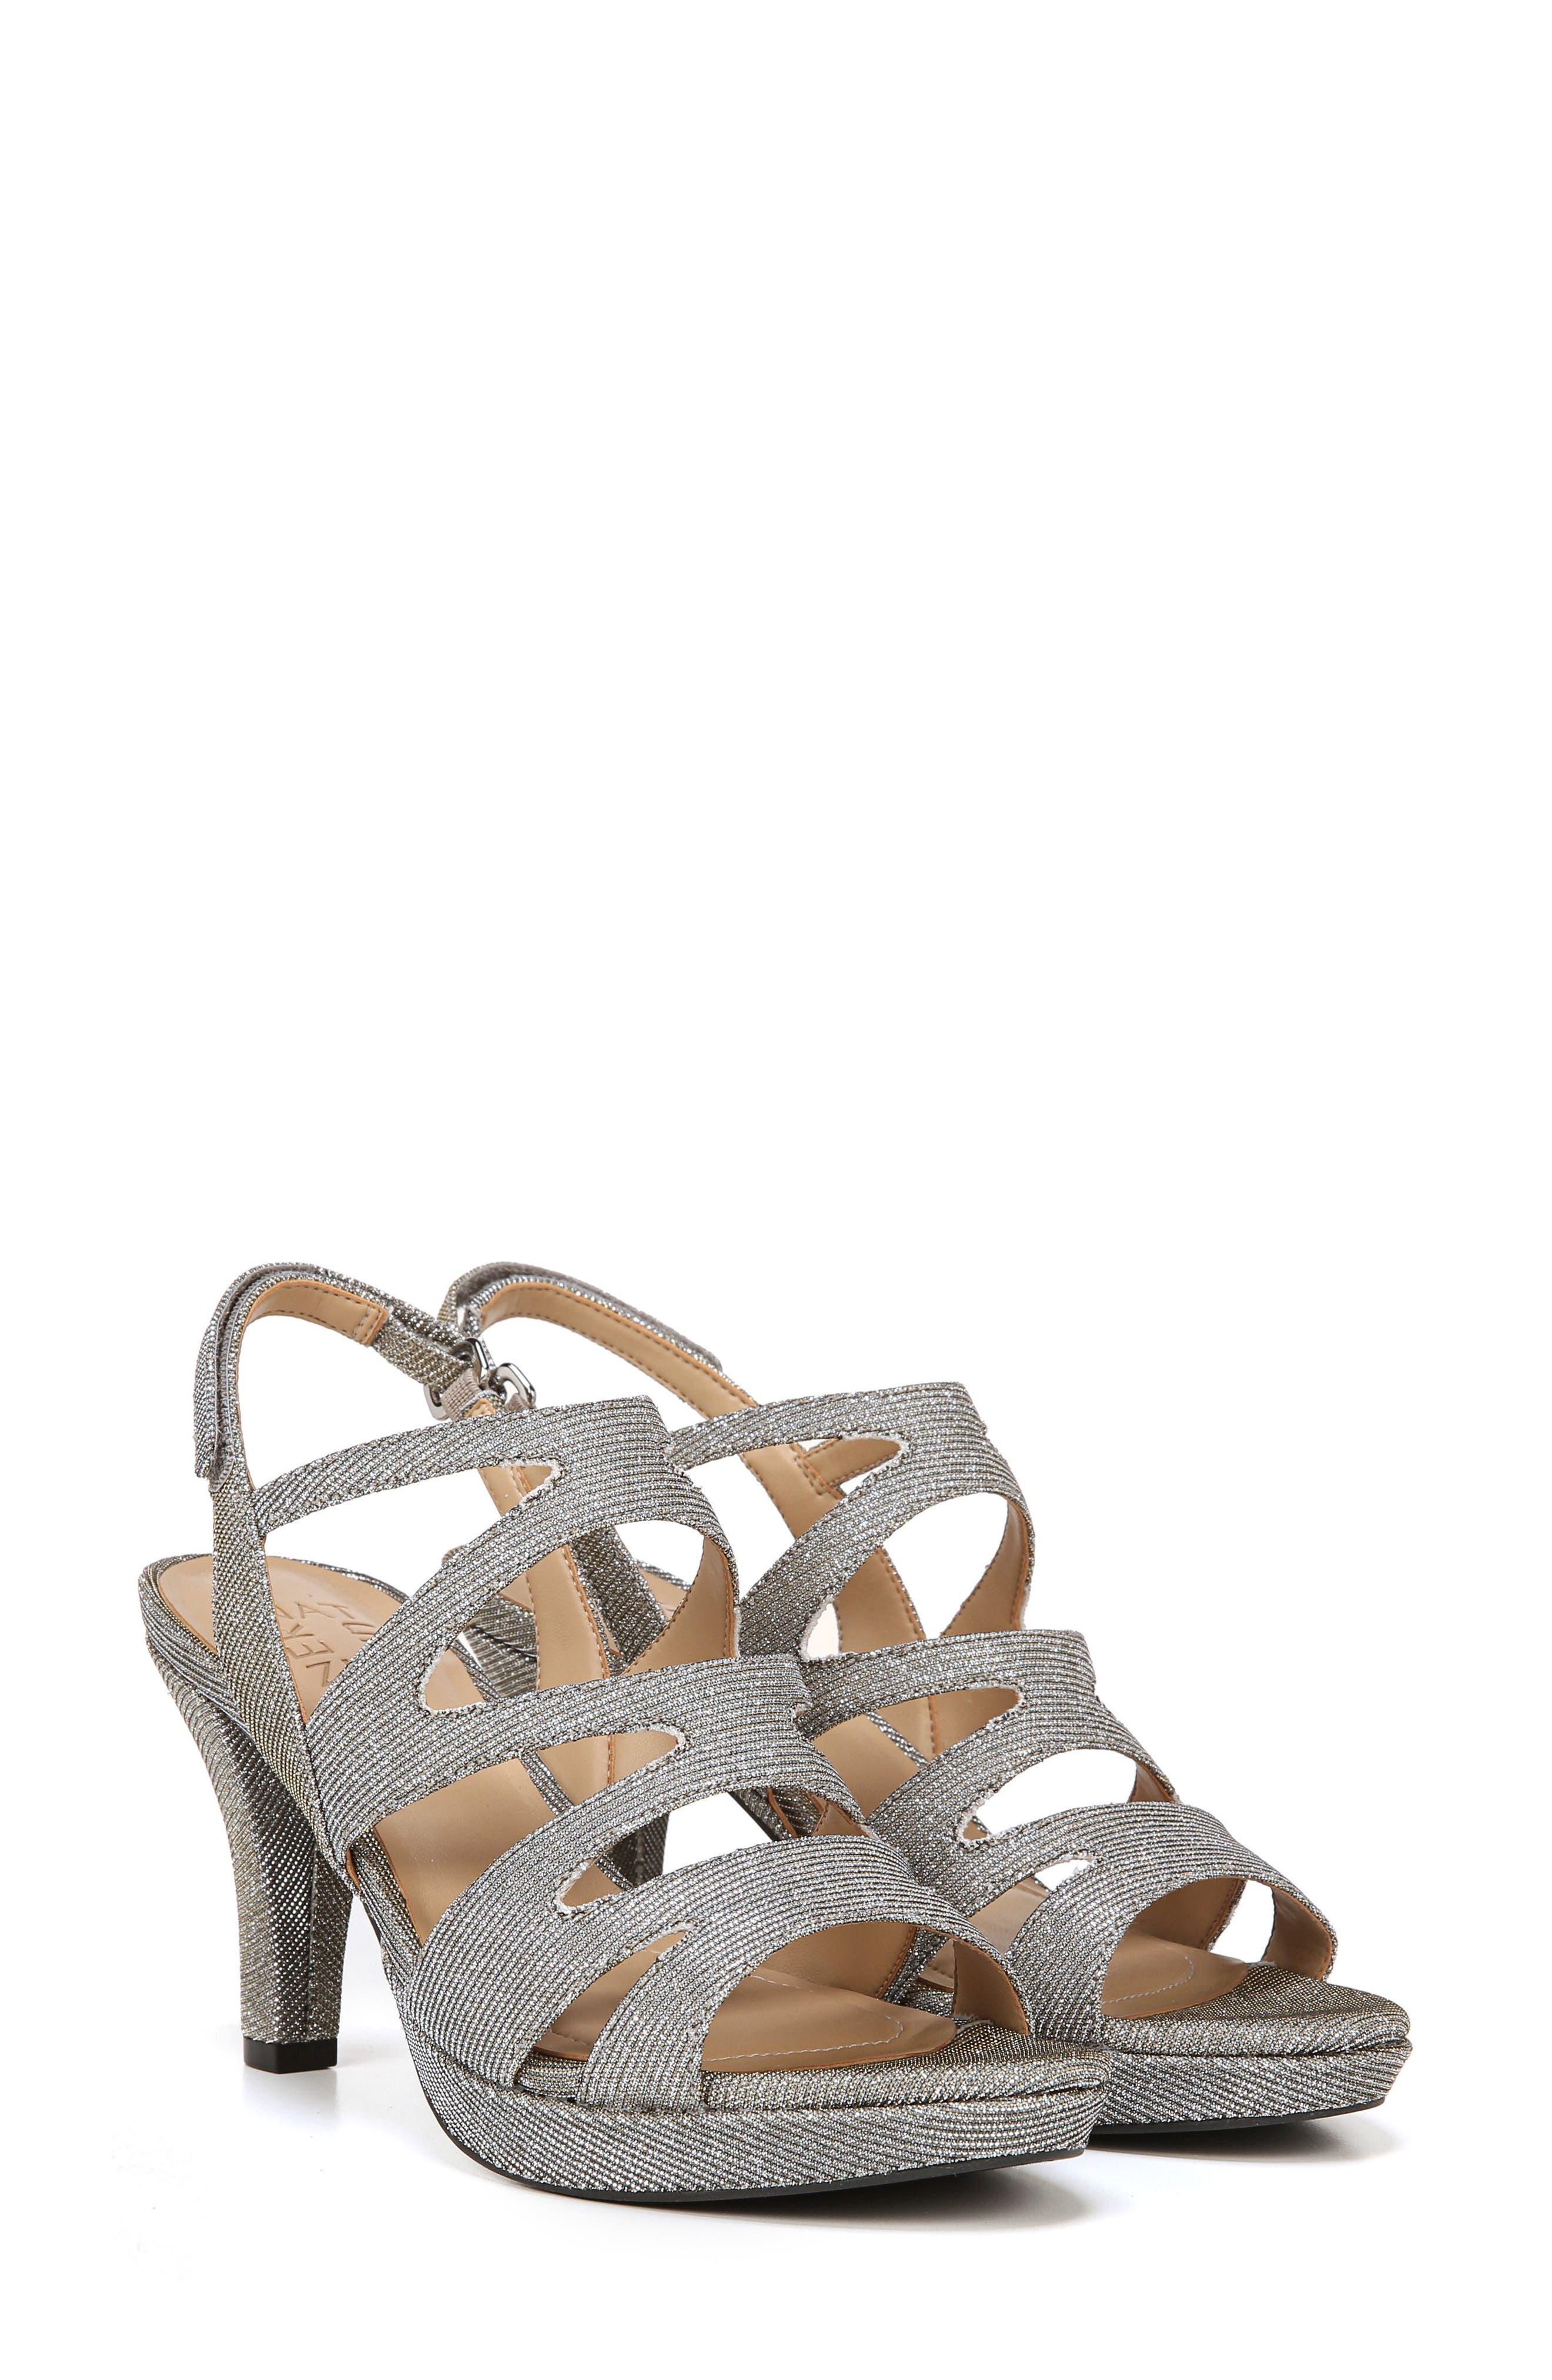 'Pressley' Slingback Platform Sandal,                             Alternate thumbnail 8, color,                             043